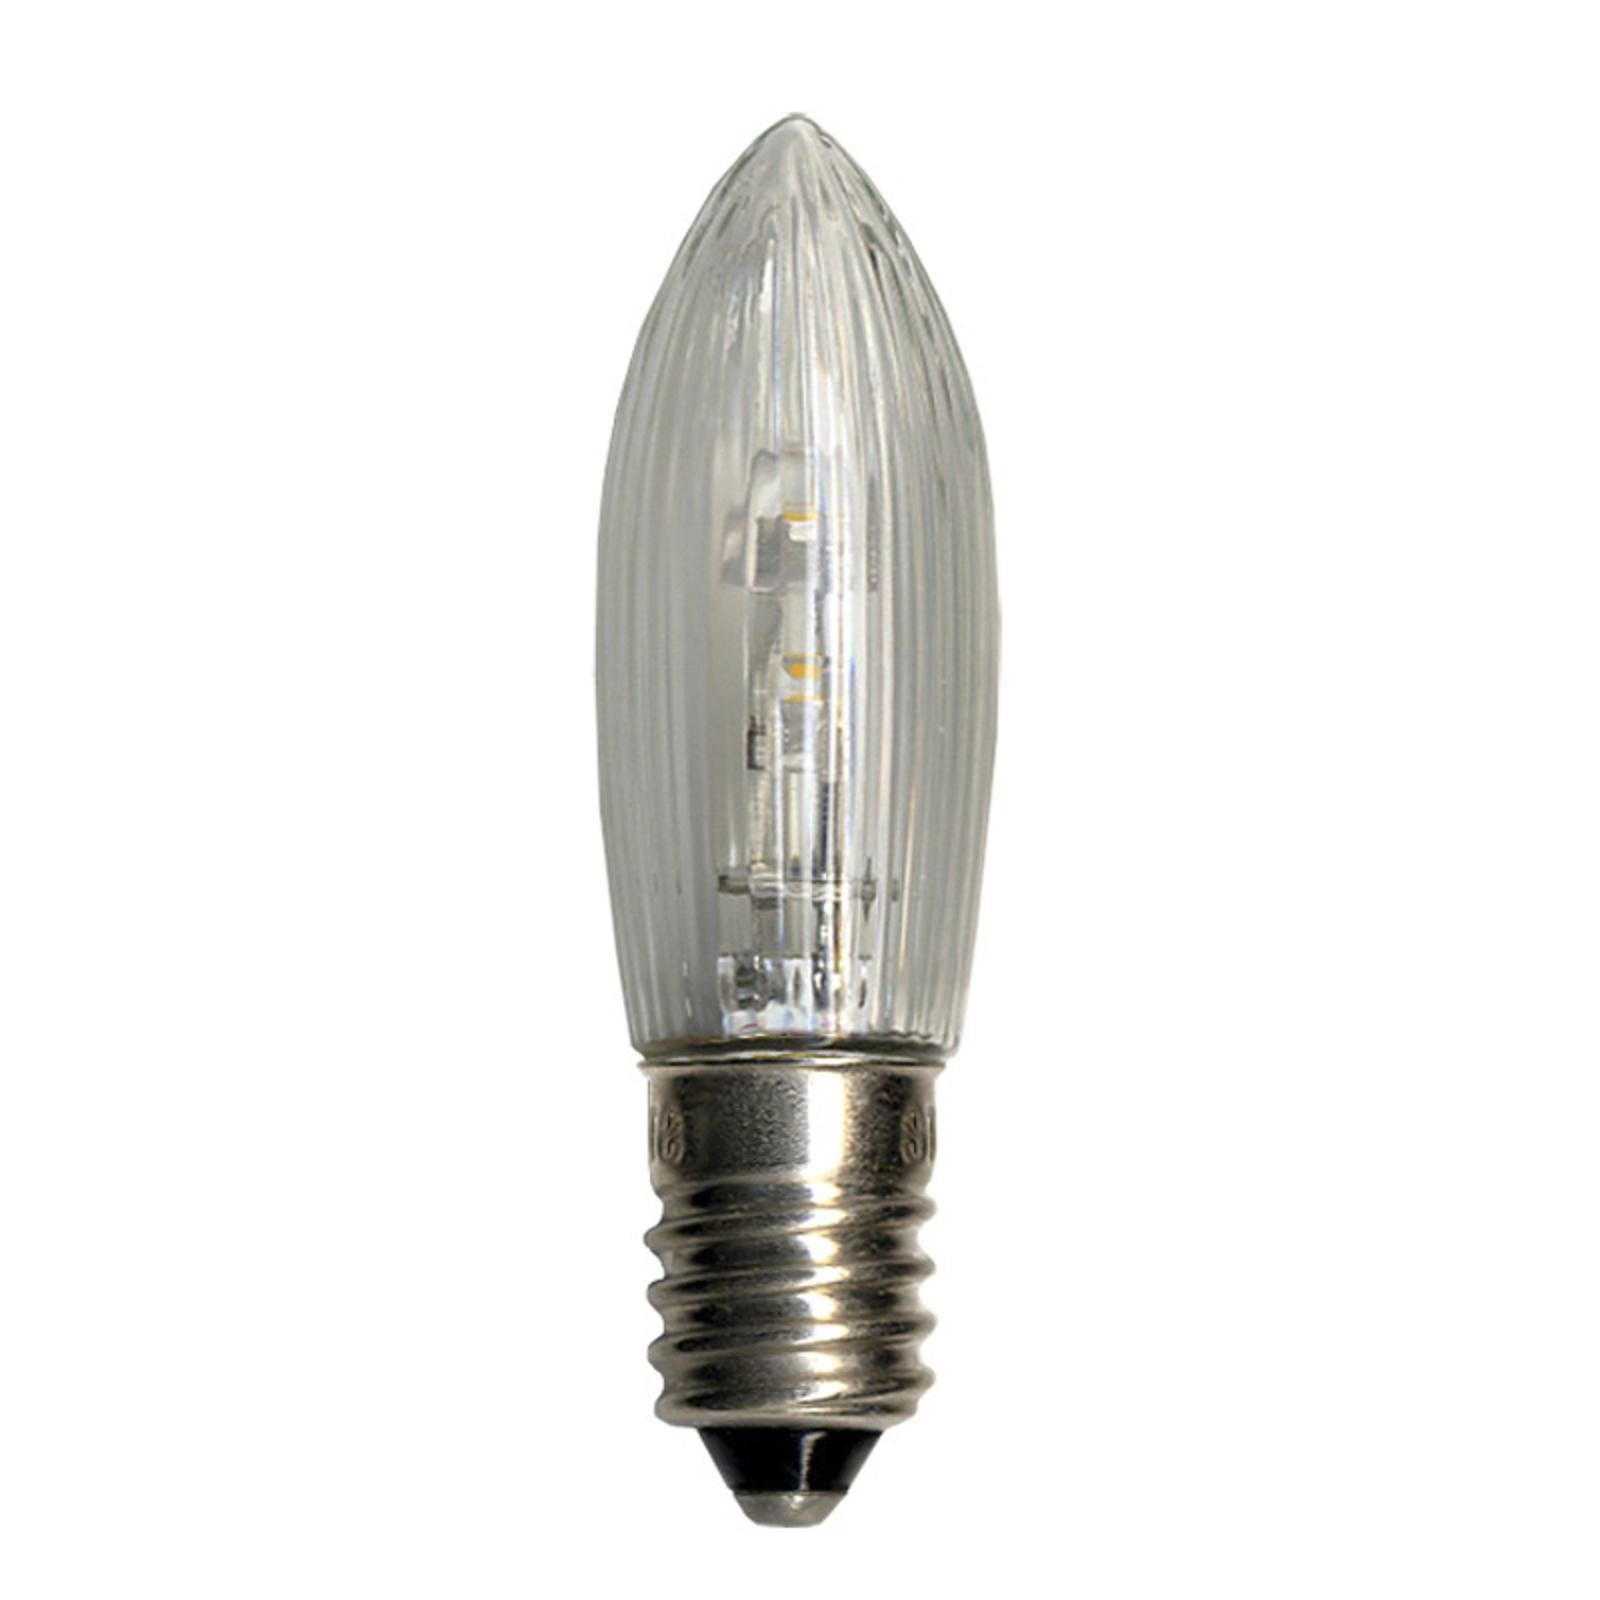 E10 0,2W 10-55V LED set 3x ricambi a candela